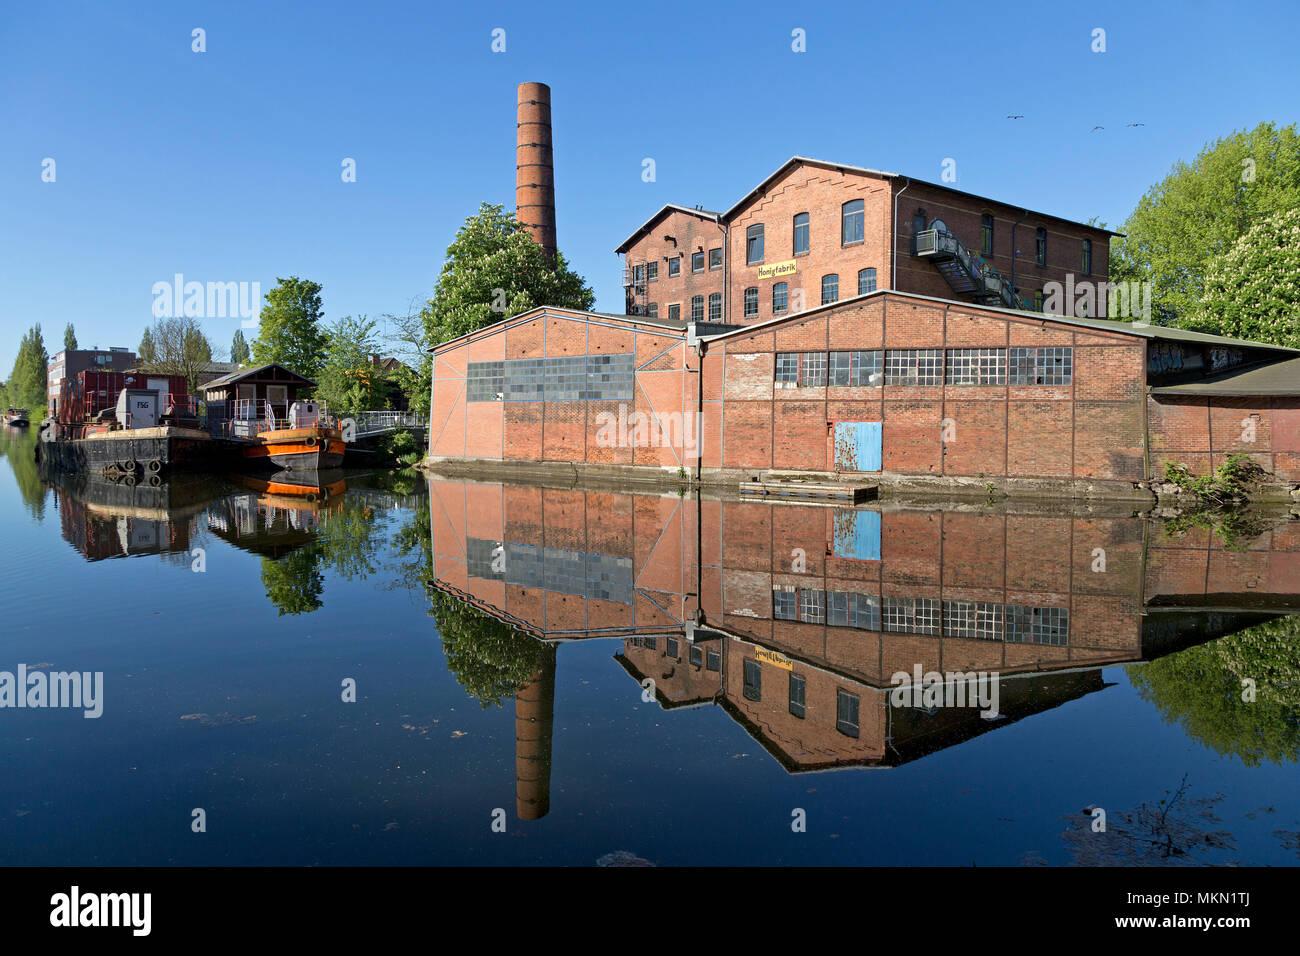 Honigfabrik, Wilhelmsburg, Hamburg, Germany - Stock Image